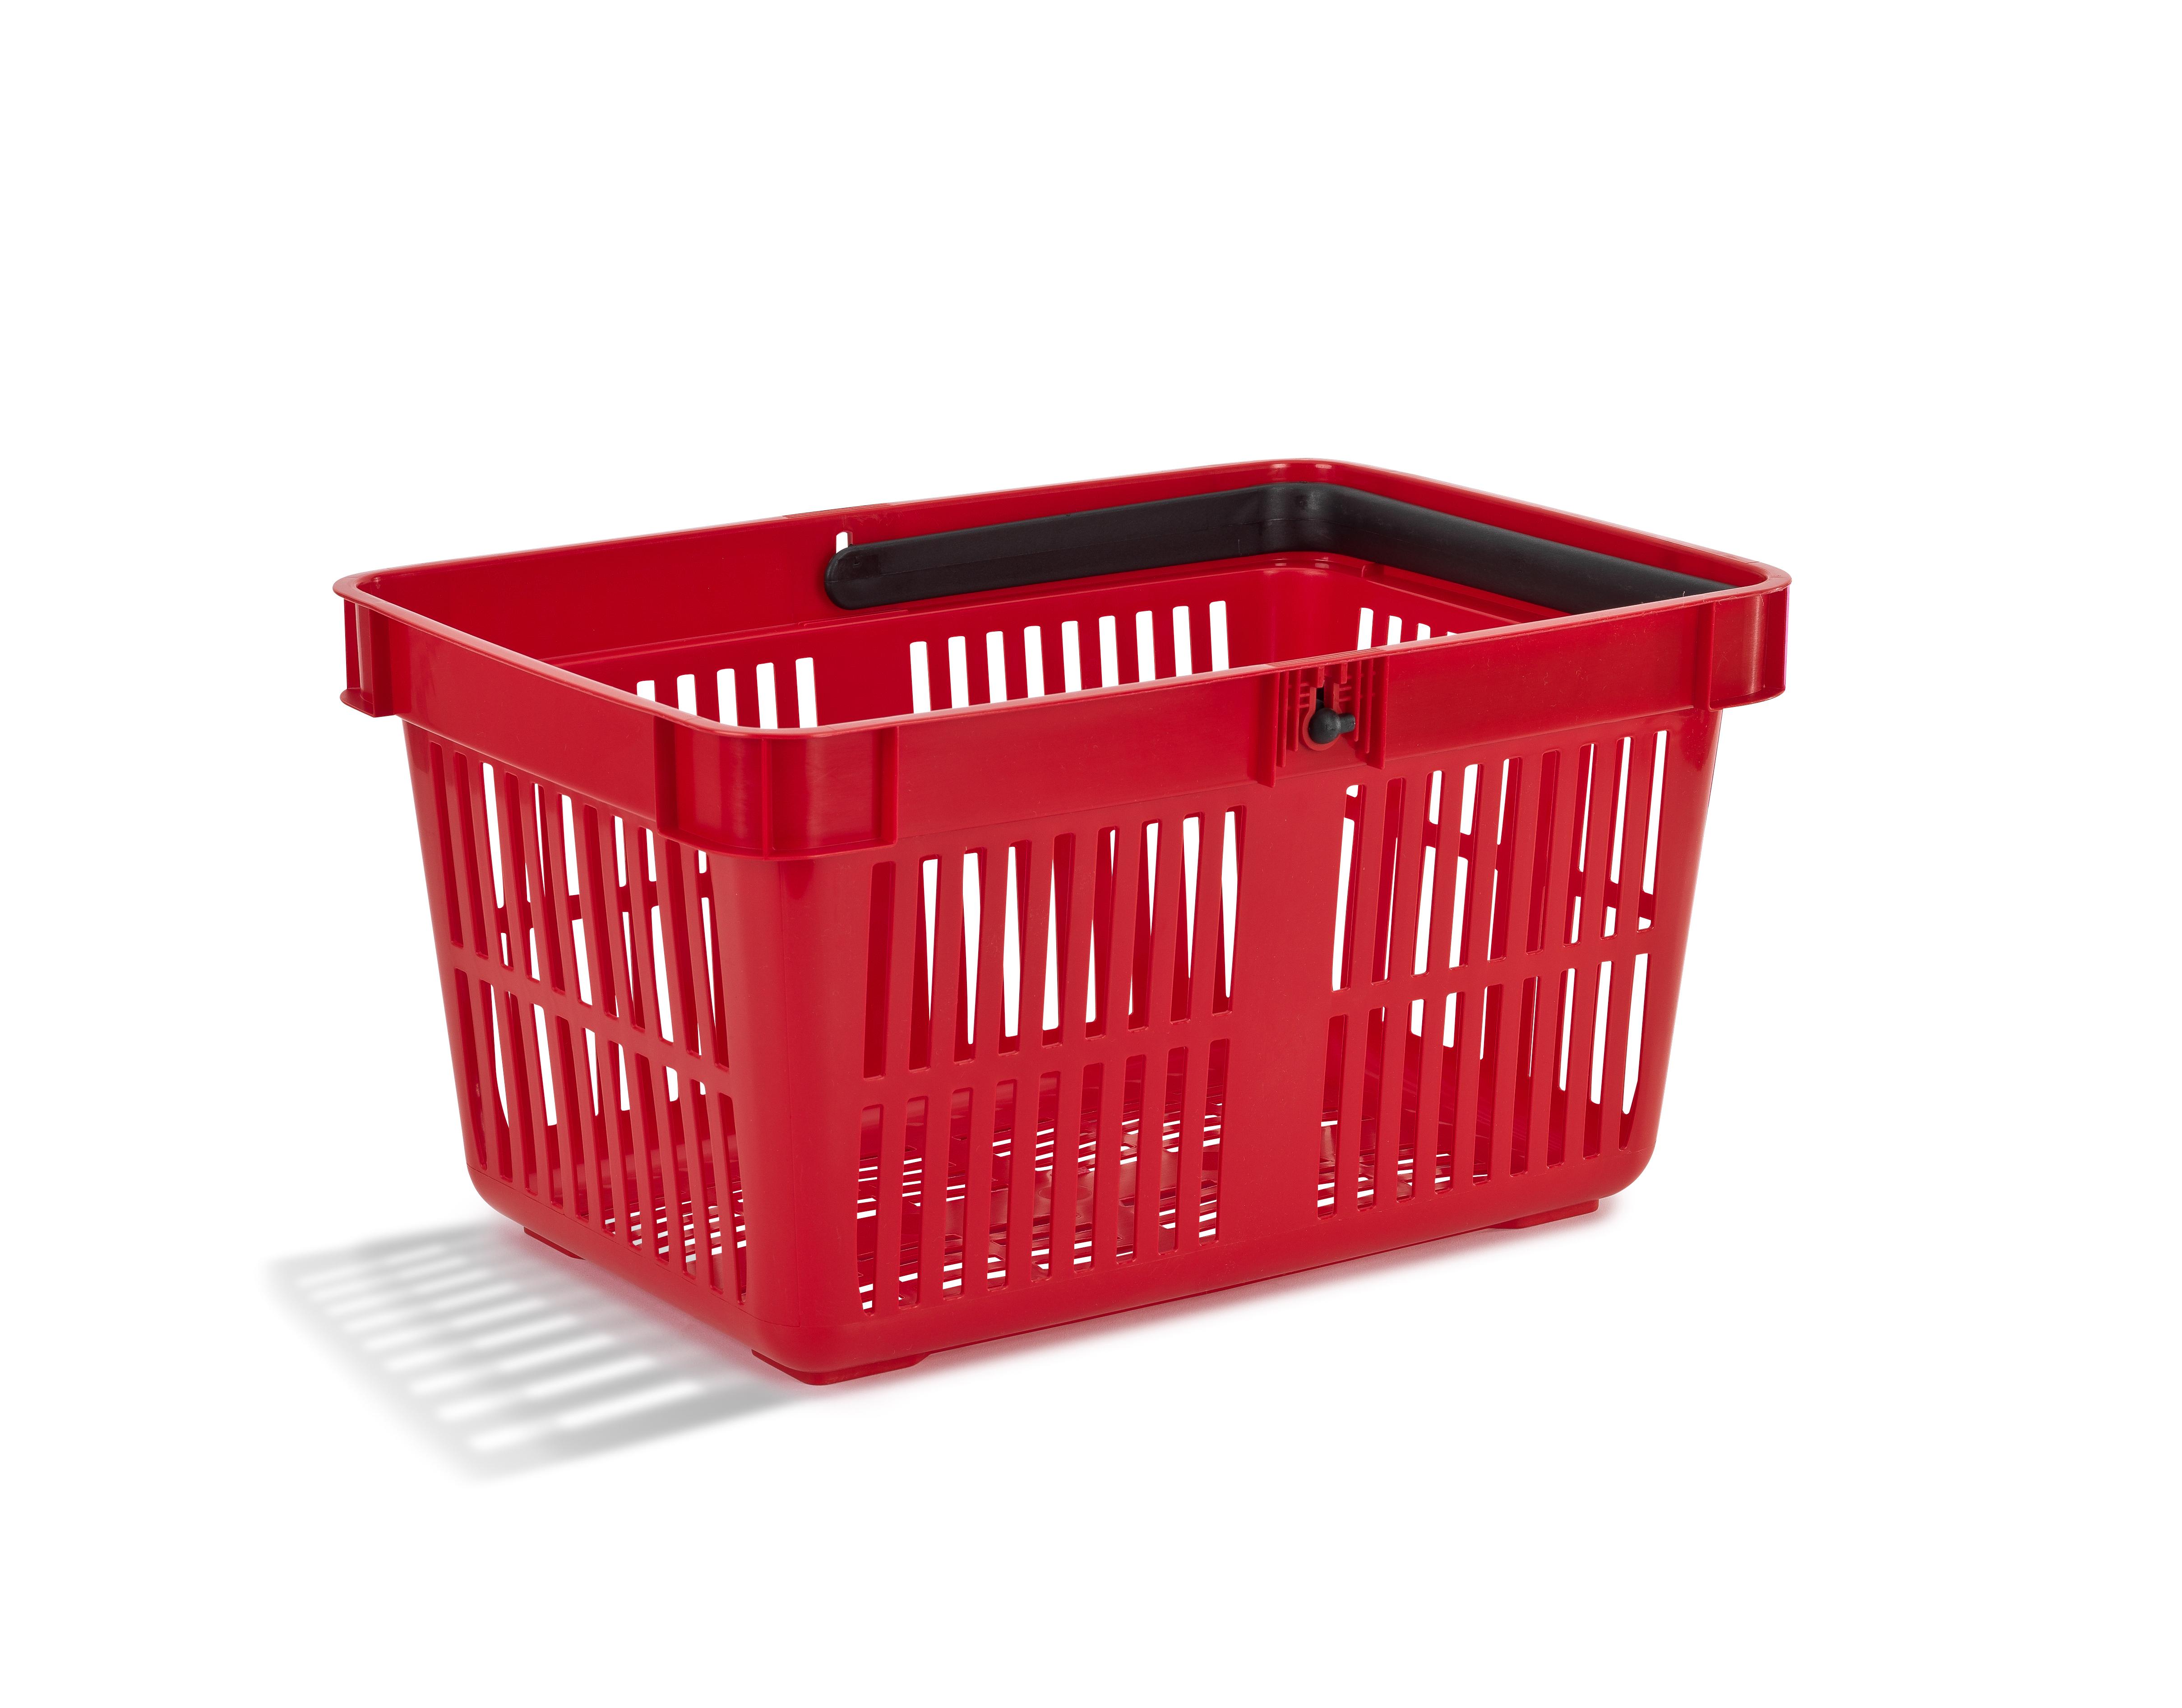 Nordiska Plast Handlekurv 27 liter rød